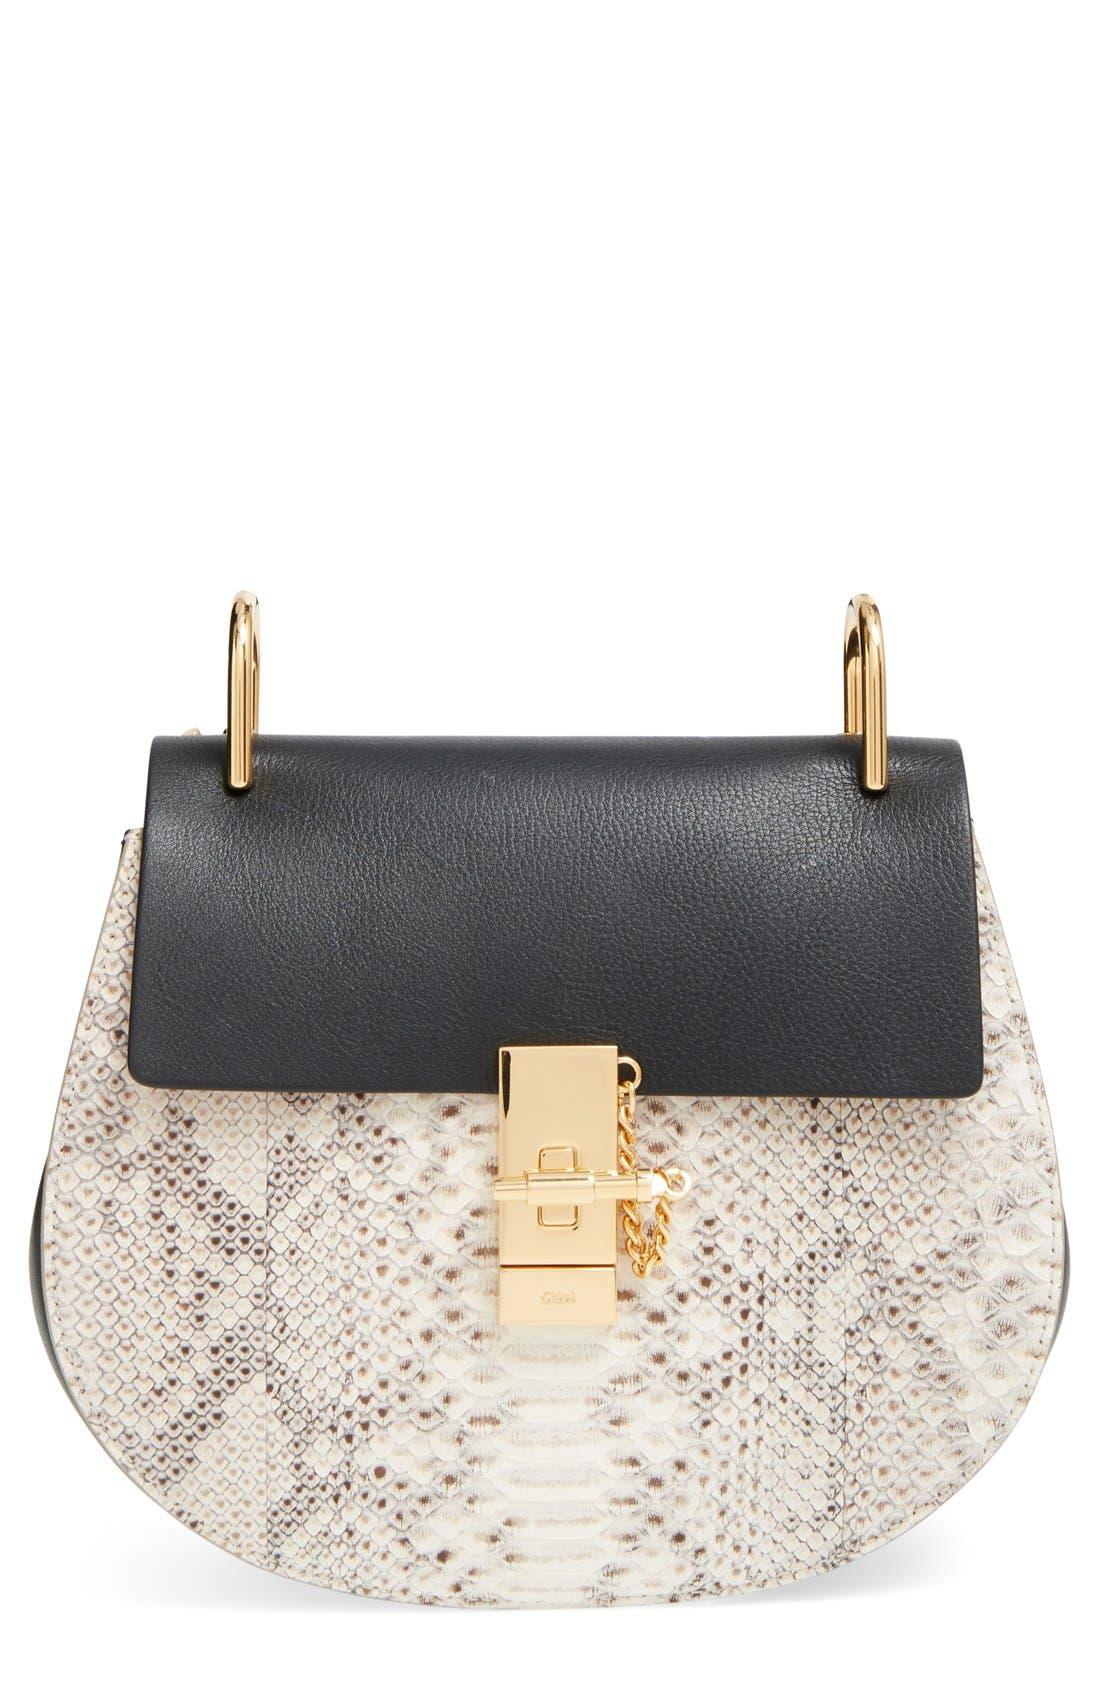 Alternate Image 1 Selected - Chloé'Small Drew' Genuine Python & Calfskin Leather Crossbody Bag